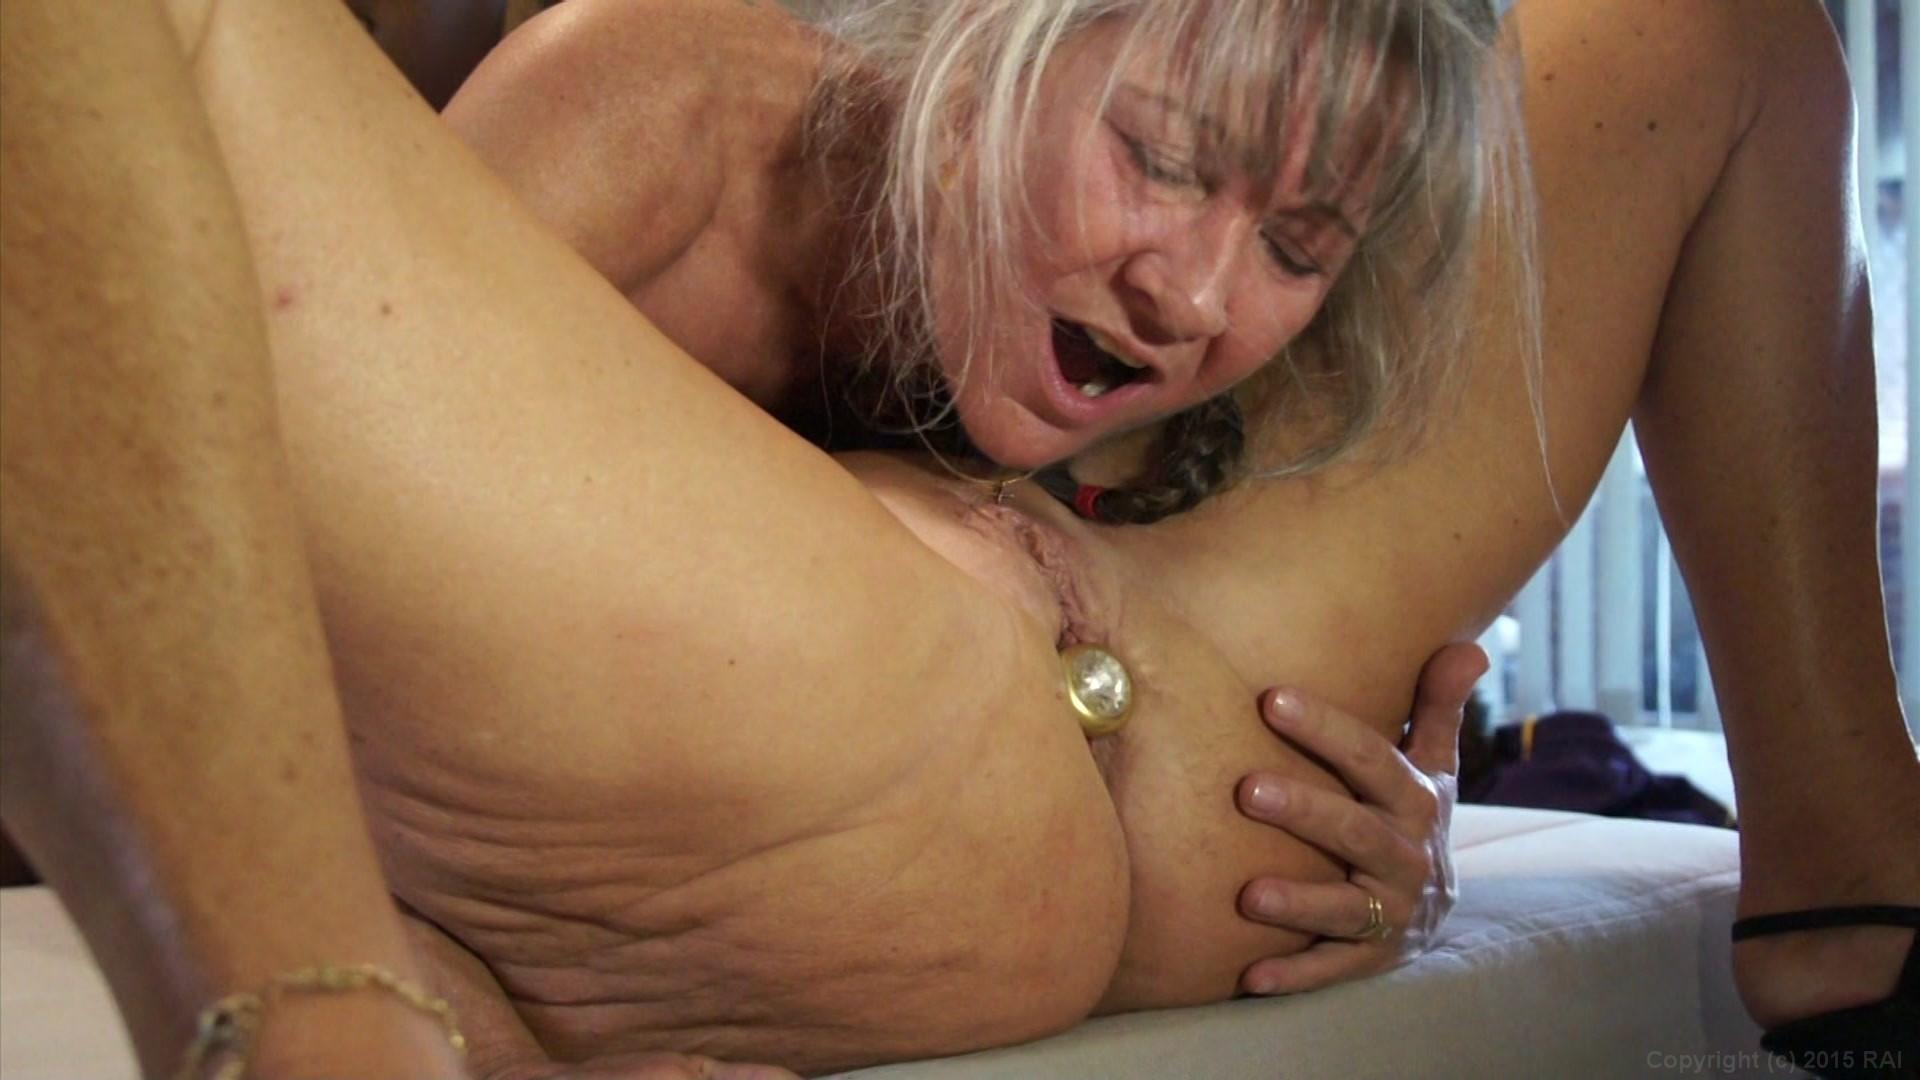 art pantyhose sexual pantyhose quality